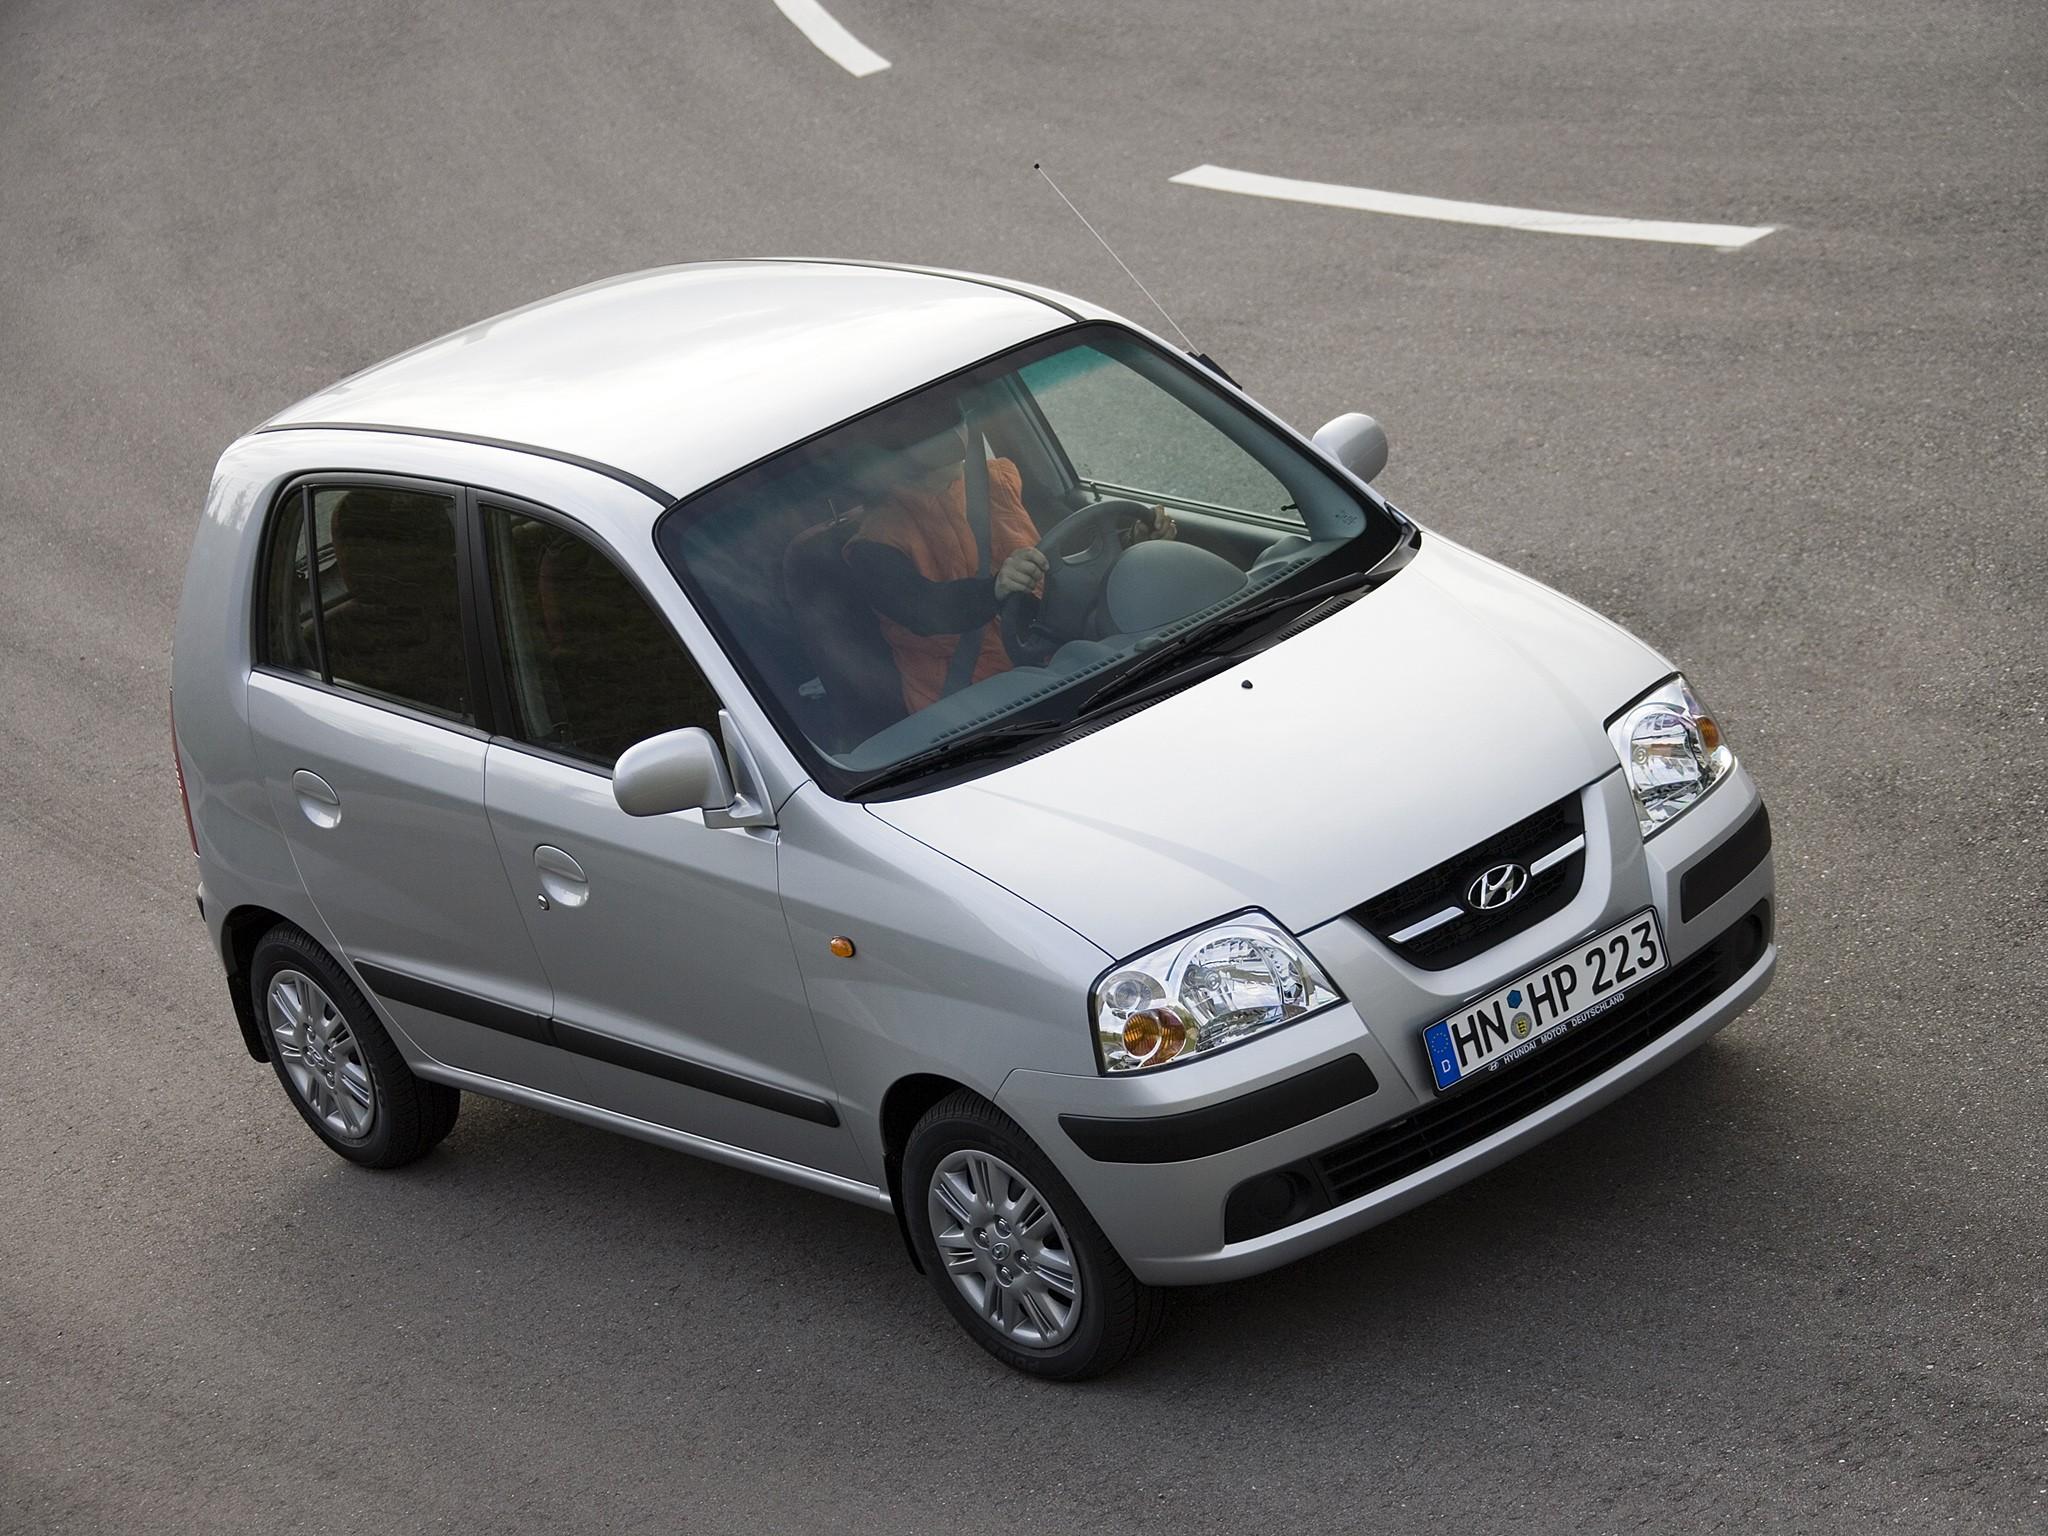 Central Buick Gmc >> HYUNDAI Atos specs - 2005, 2006, 2007, 2008 - autoevolution